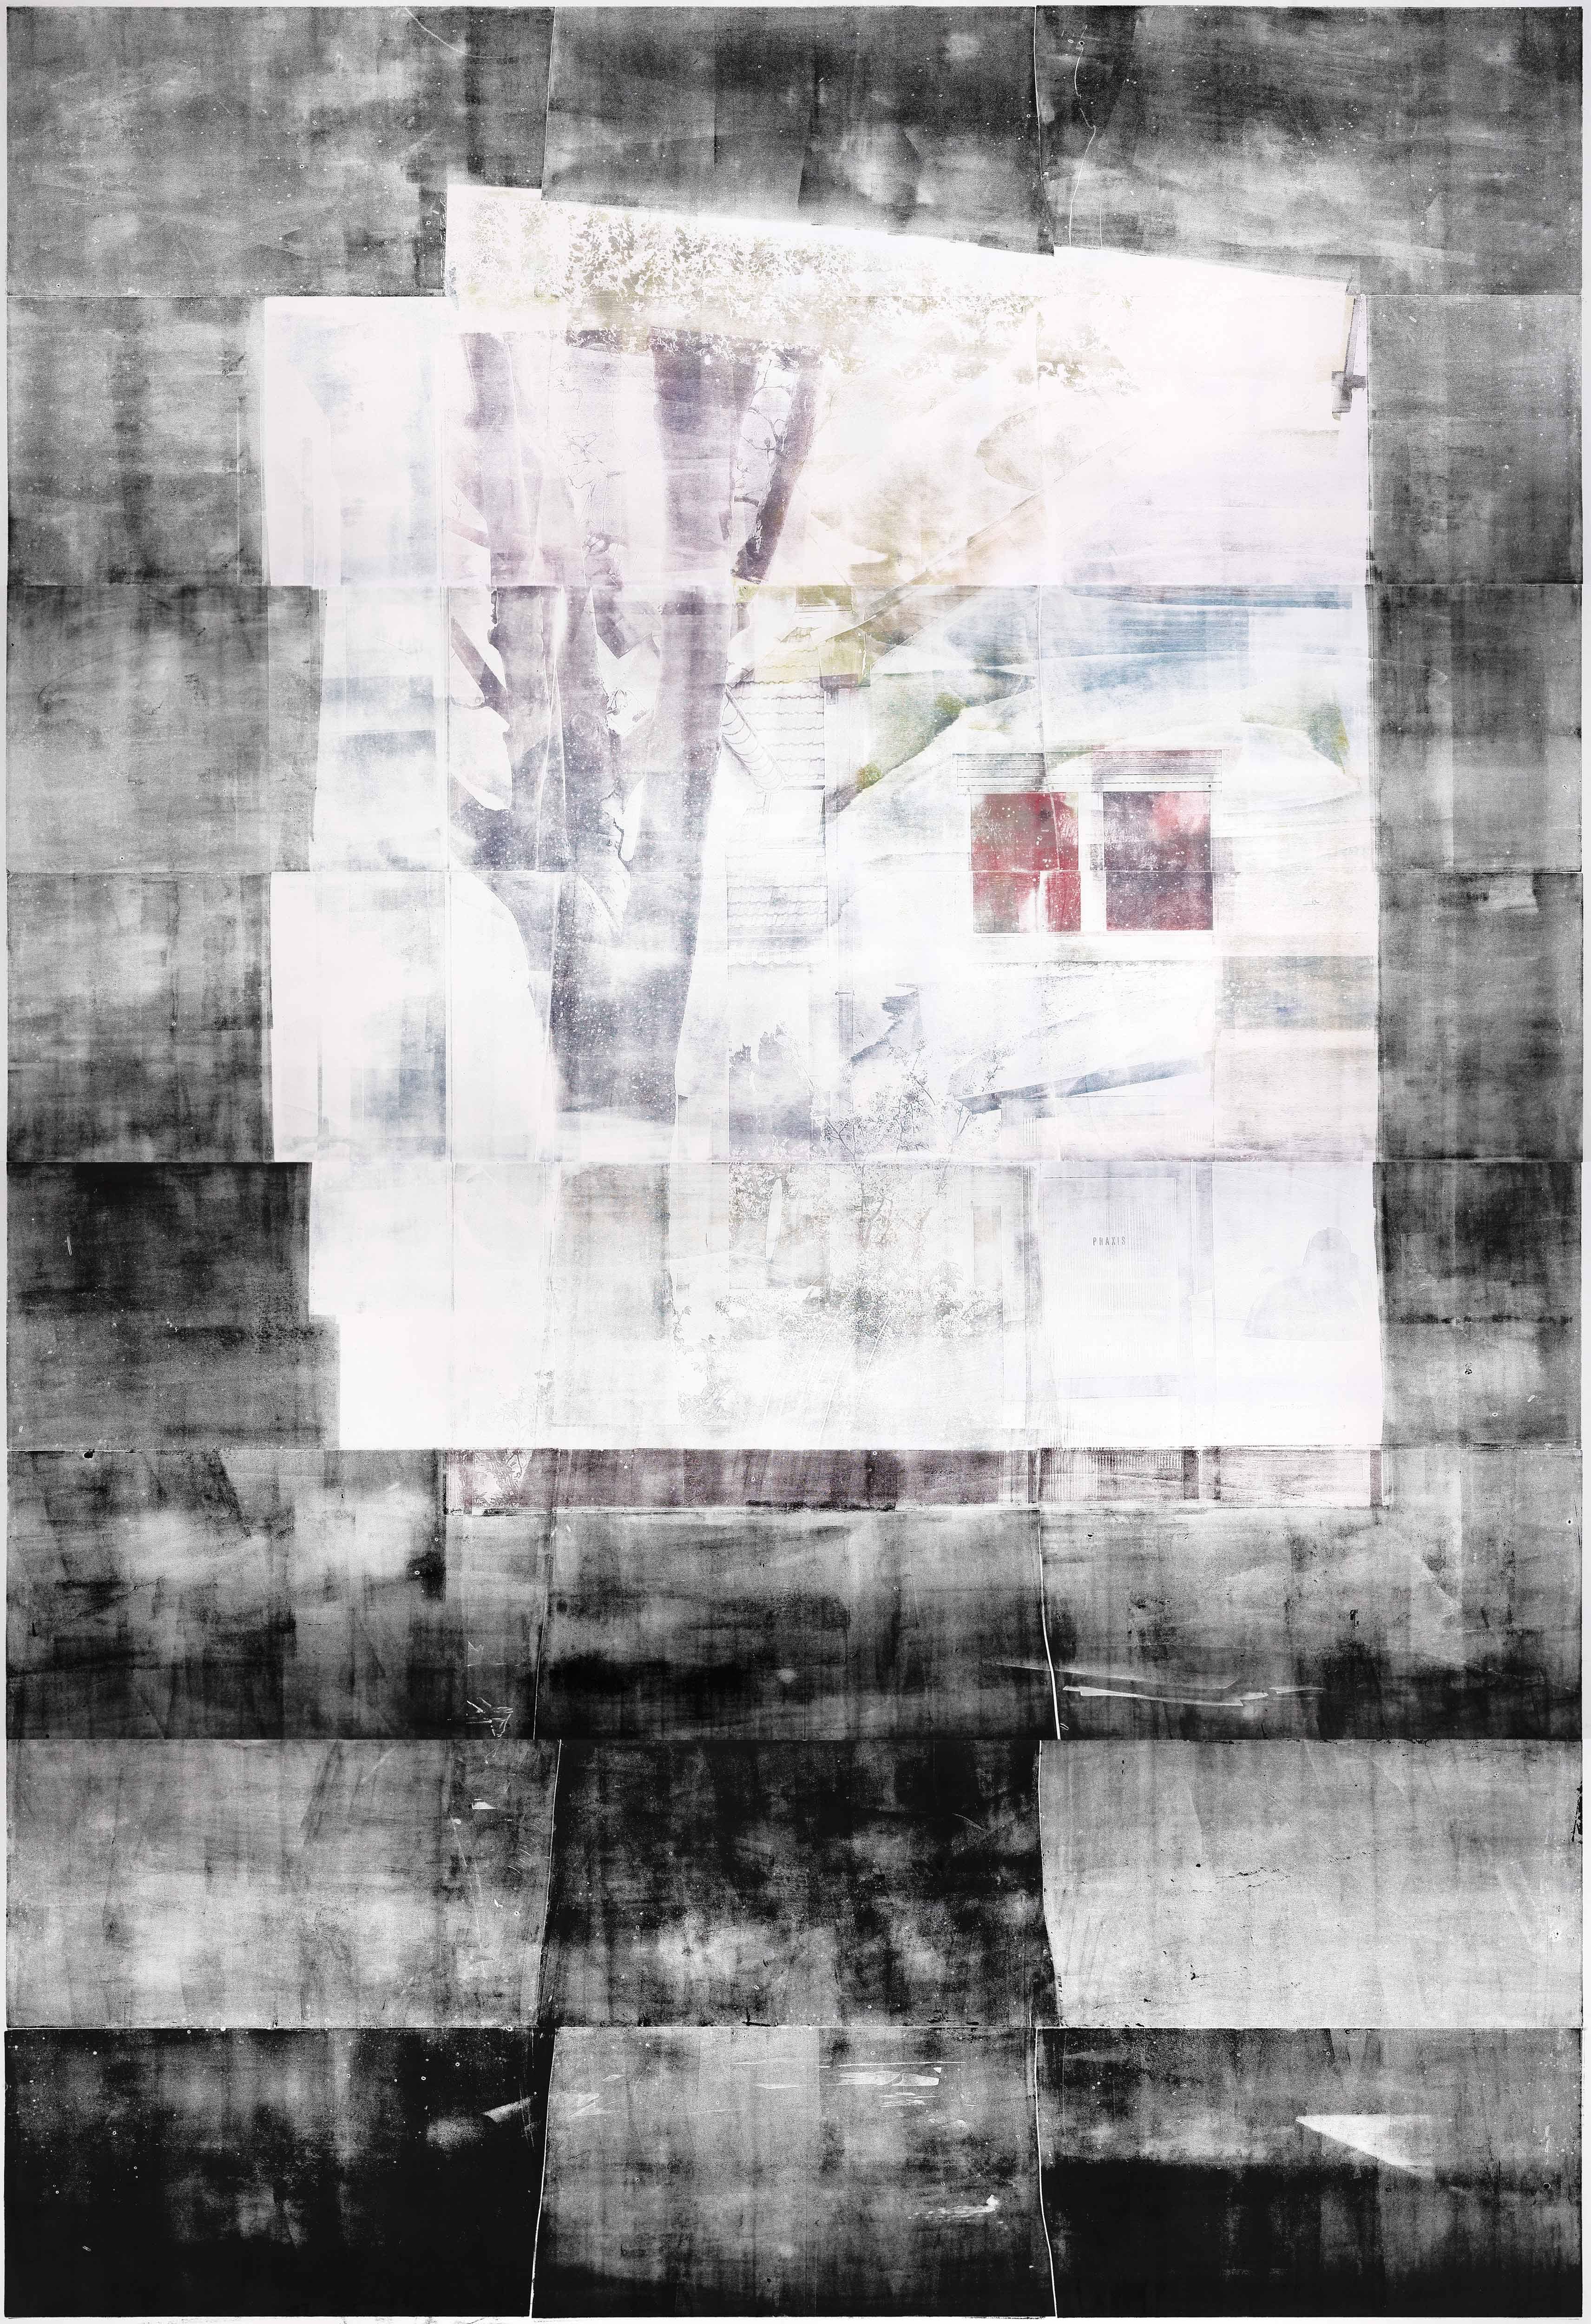 Fenster (Sonnenaufgang), 2019, wood engraving, 383,4 x 272,8 cm, Genaro Strobel